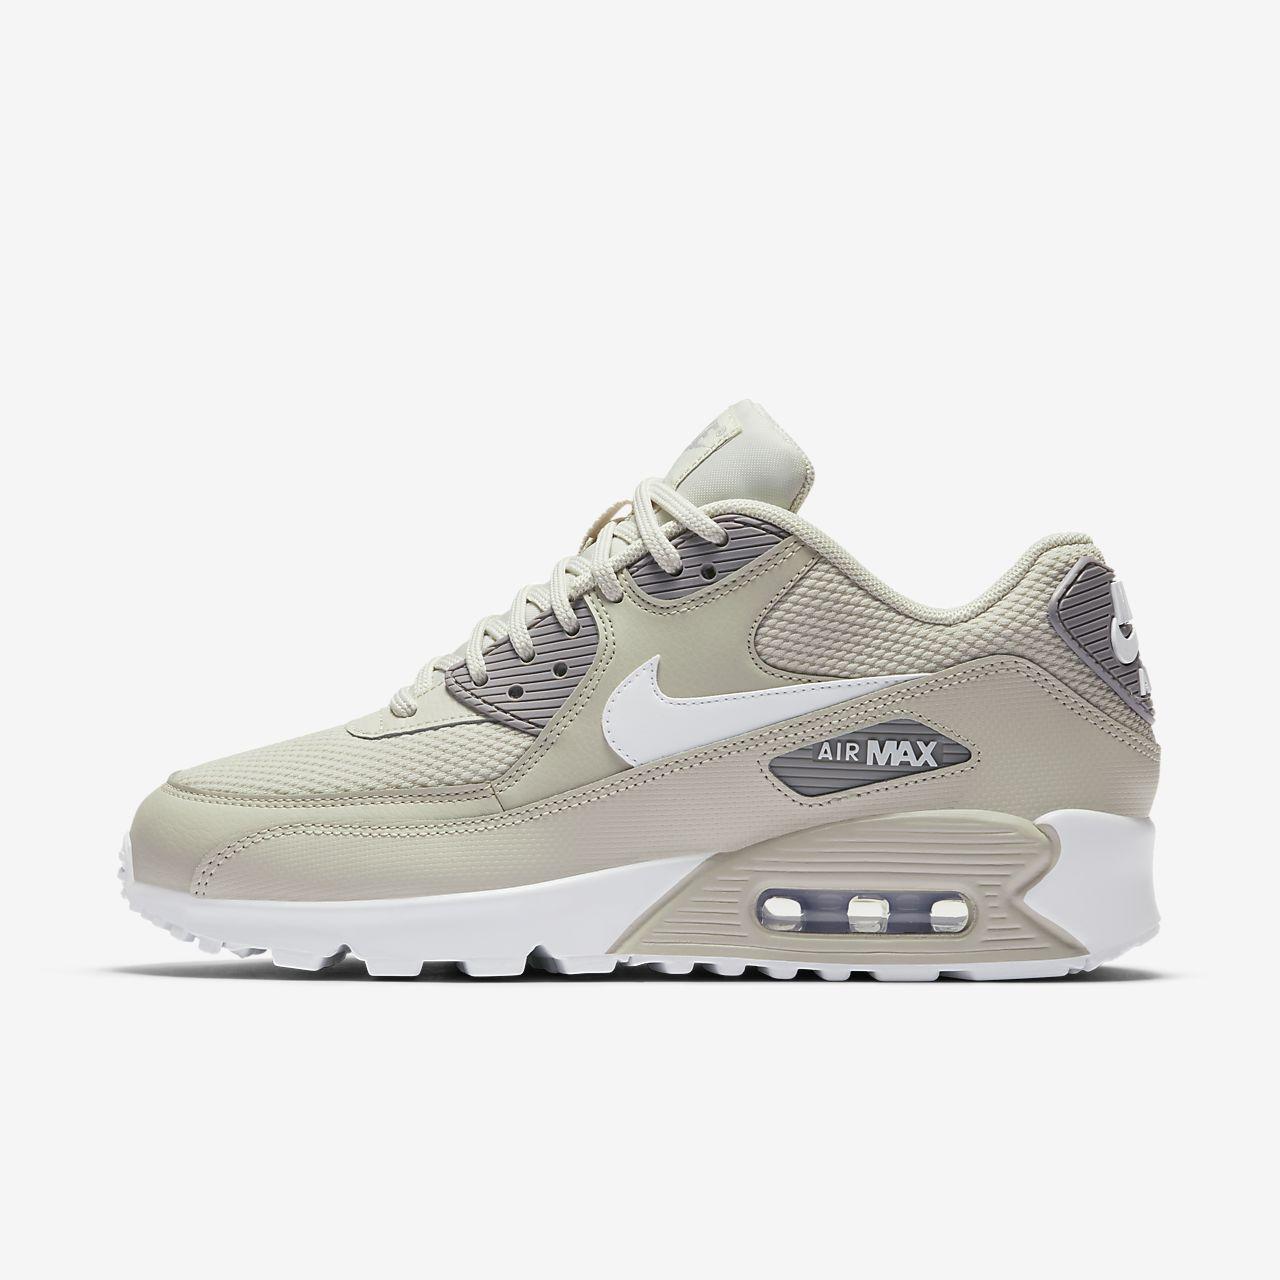 nike-air-max-90-womens ... nike air max 90 womenu0027s shoe TCJNPAM